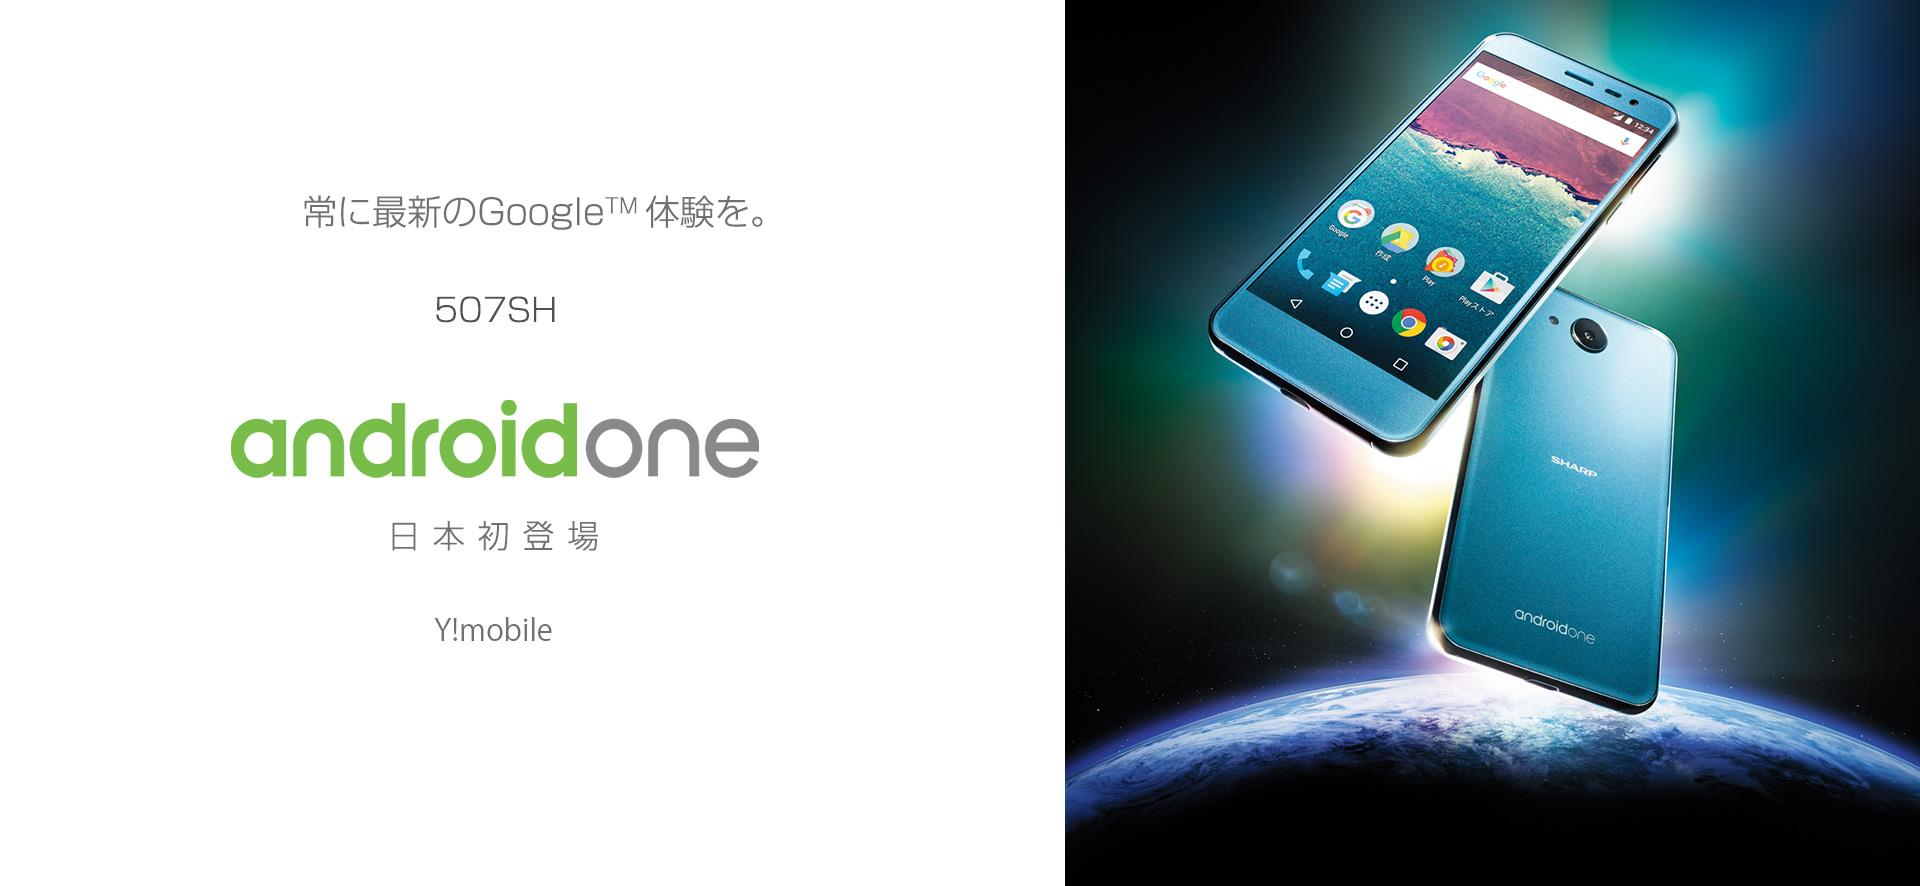 Sharp se připojil do programu Android One